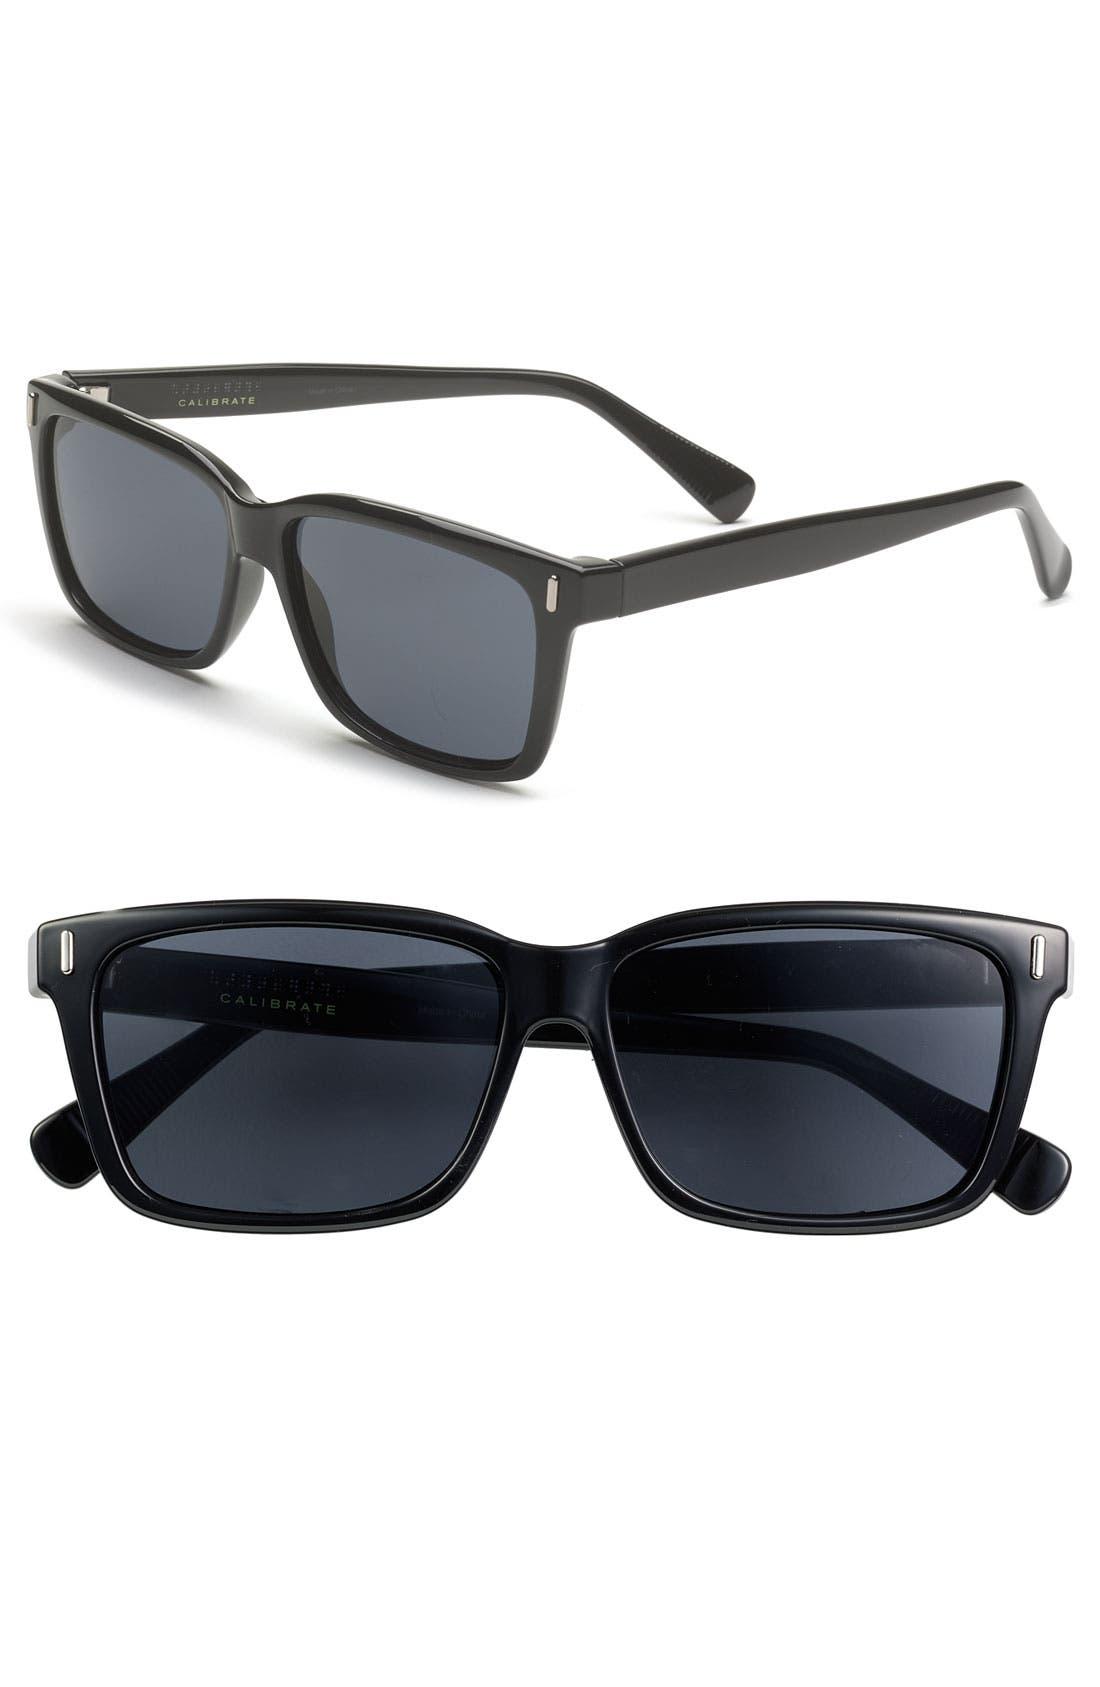 Alternate Image 1 Selected - Calibrate 'Josh' Sunglasses